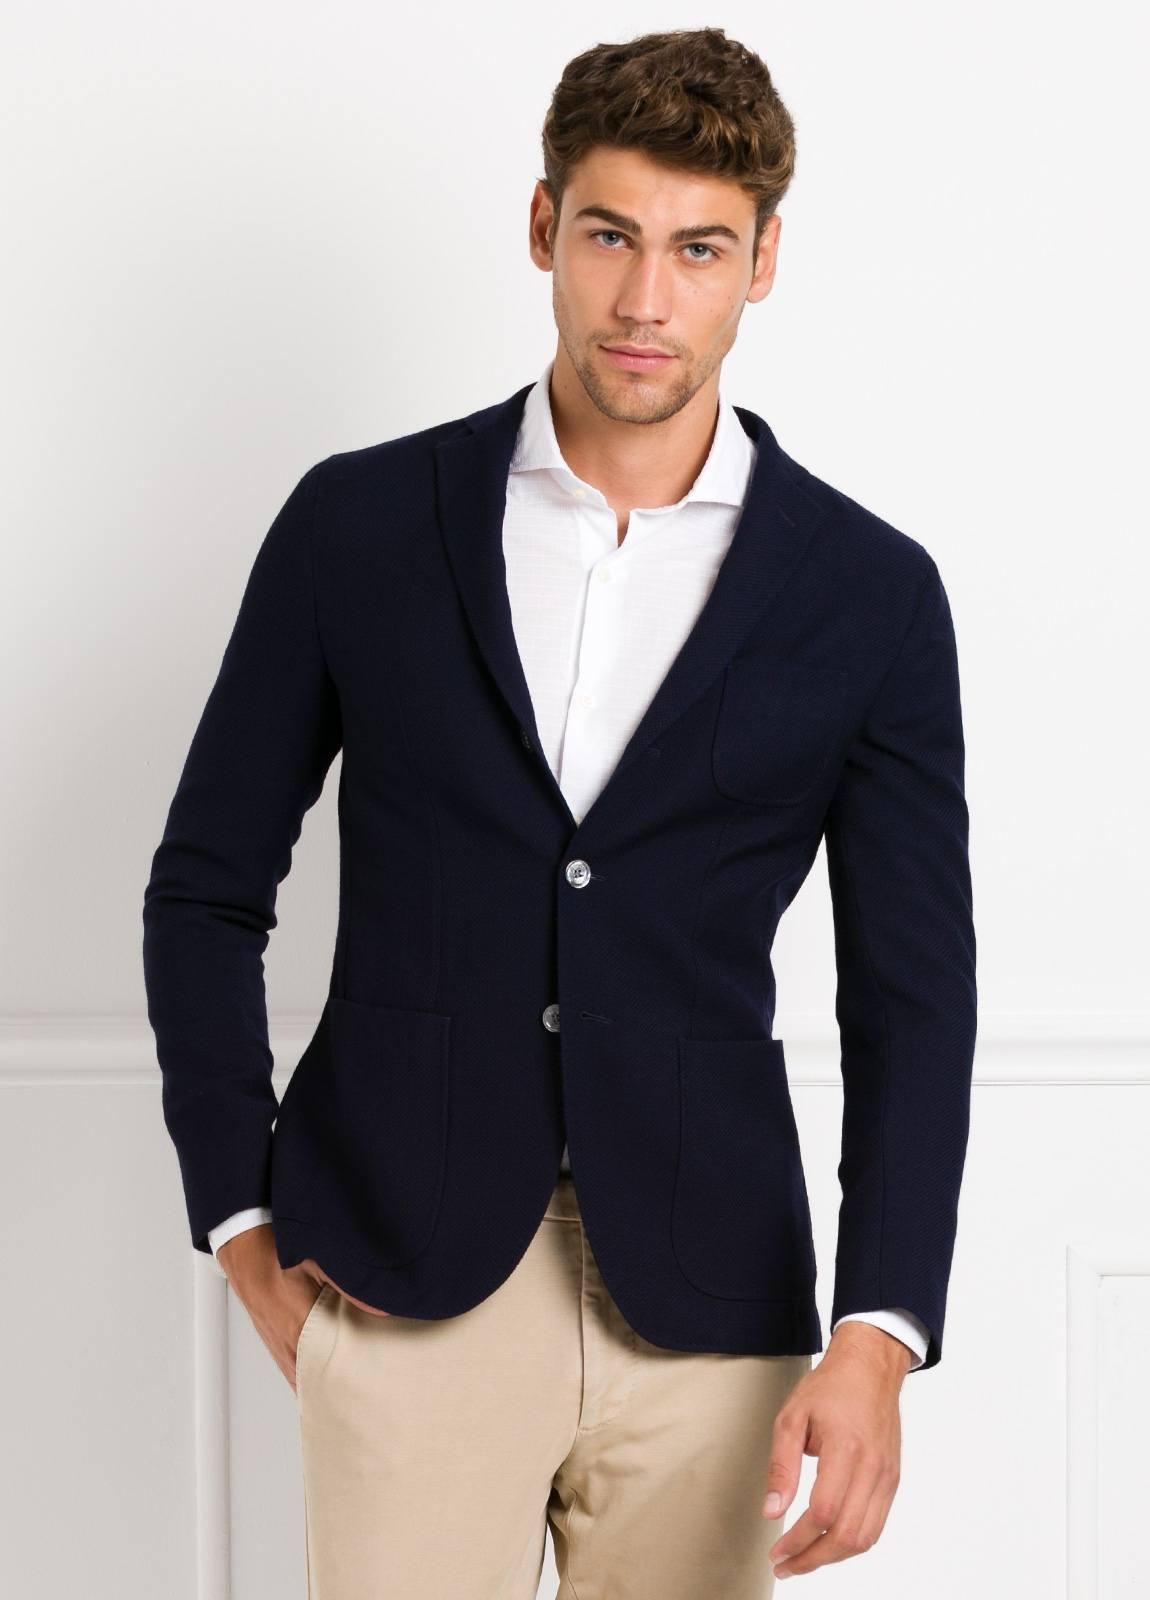 Americana SOFT JACKET Slim Fit textura color azul marino, 100% Lana fria. - Ítem3